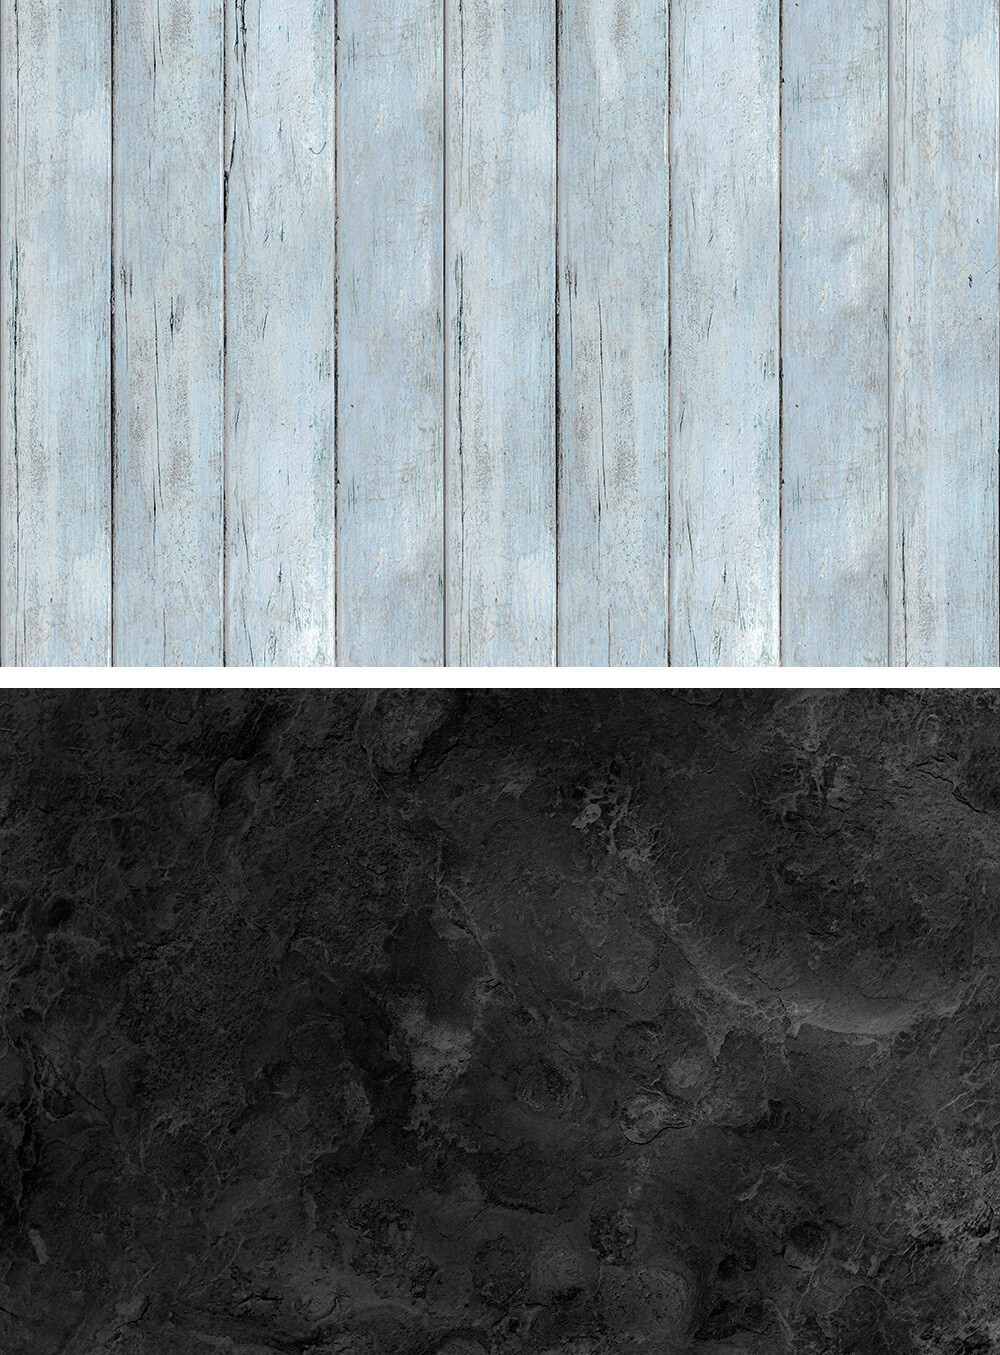 PVC Double Sided Backgrounds 58x86 cm - E01